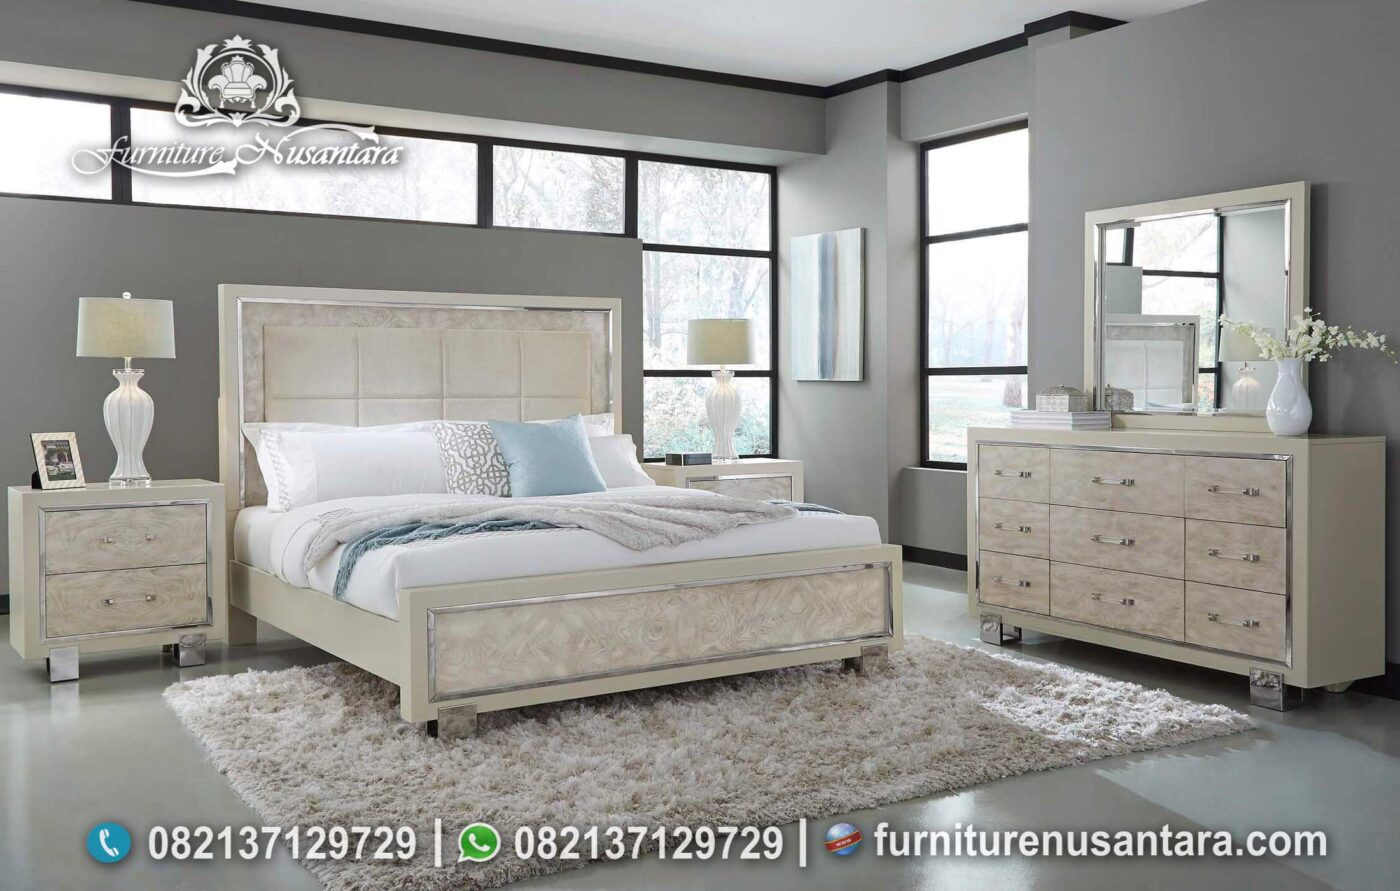 Kamar Tidur Minimalis Casual Modern KS-163, Furniture Nusantara